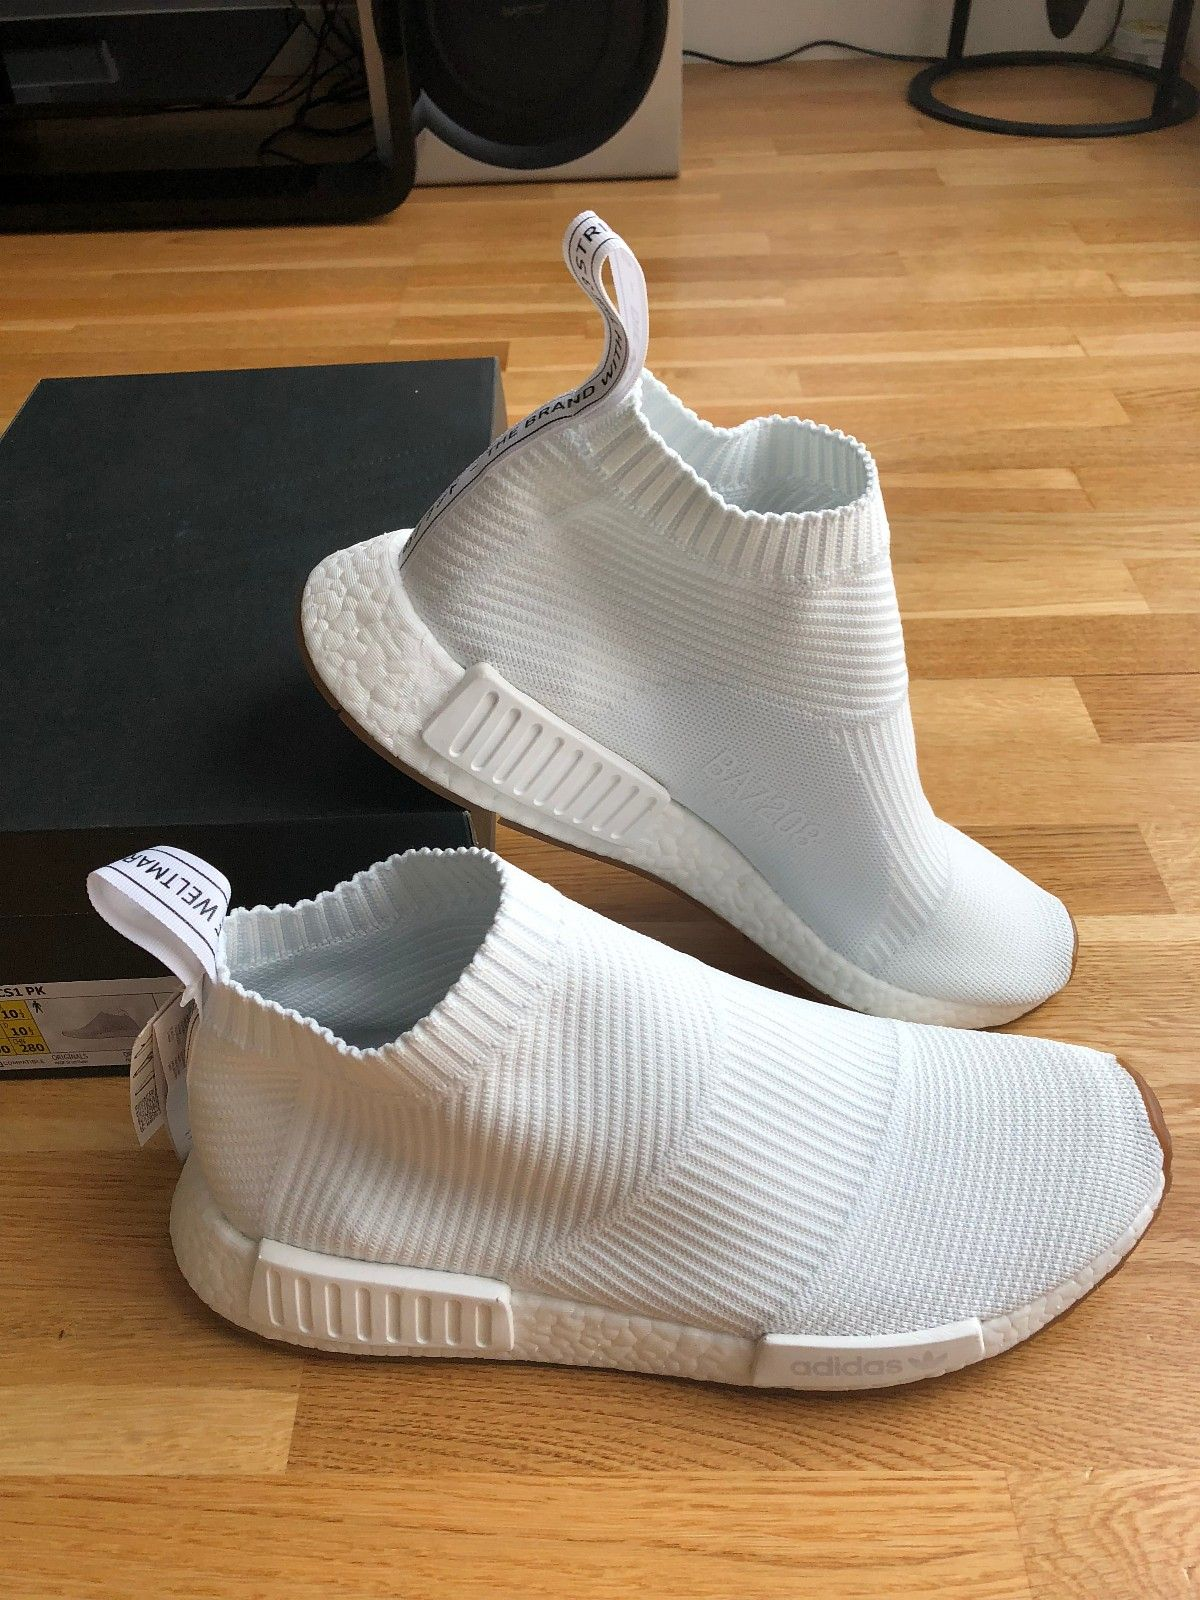 Adidas sko i str 44,5   FINN.no